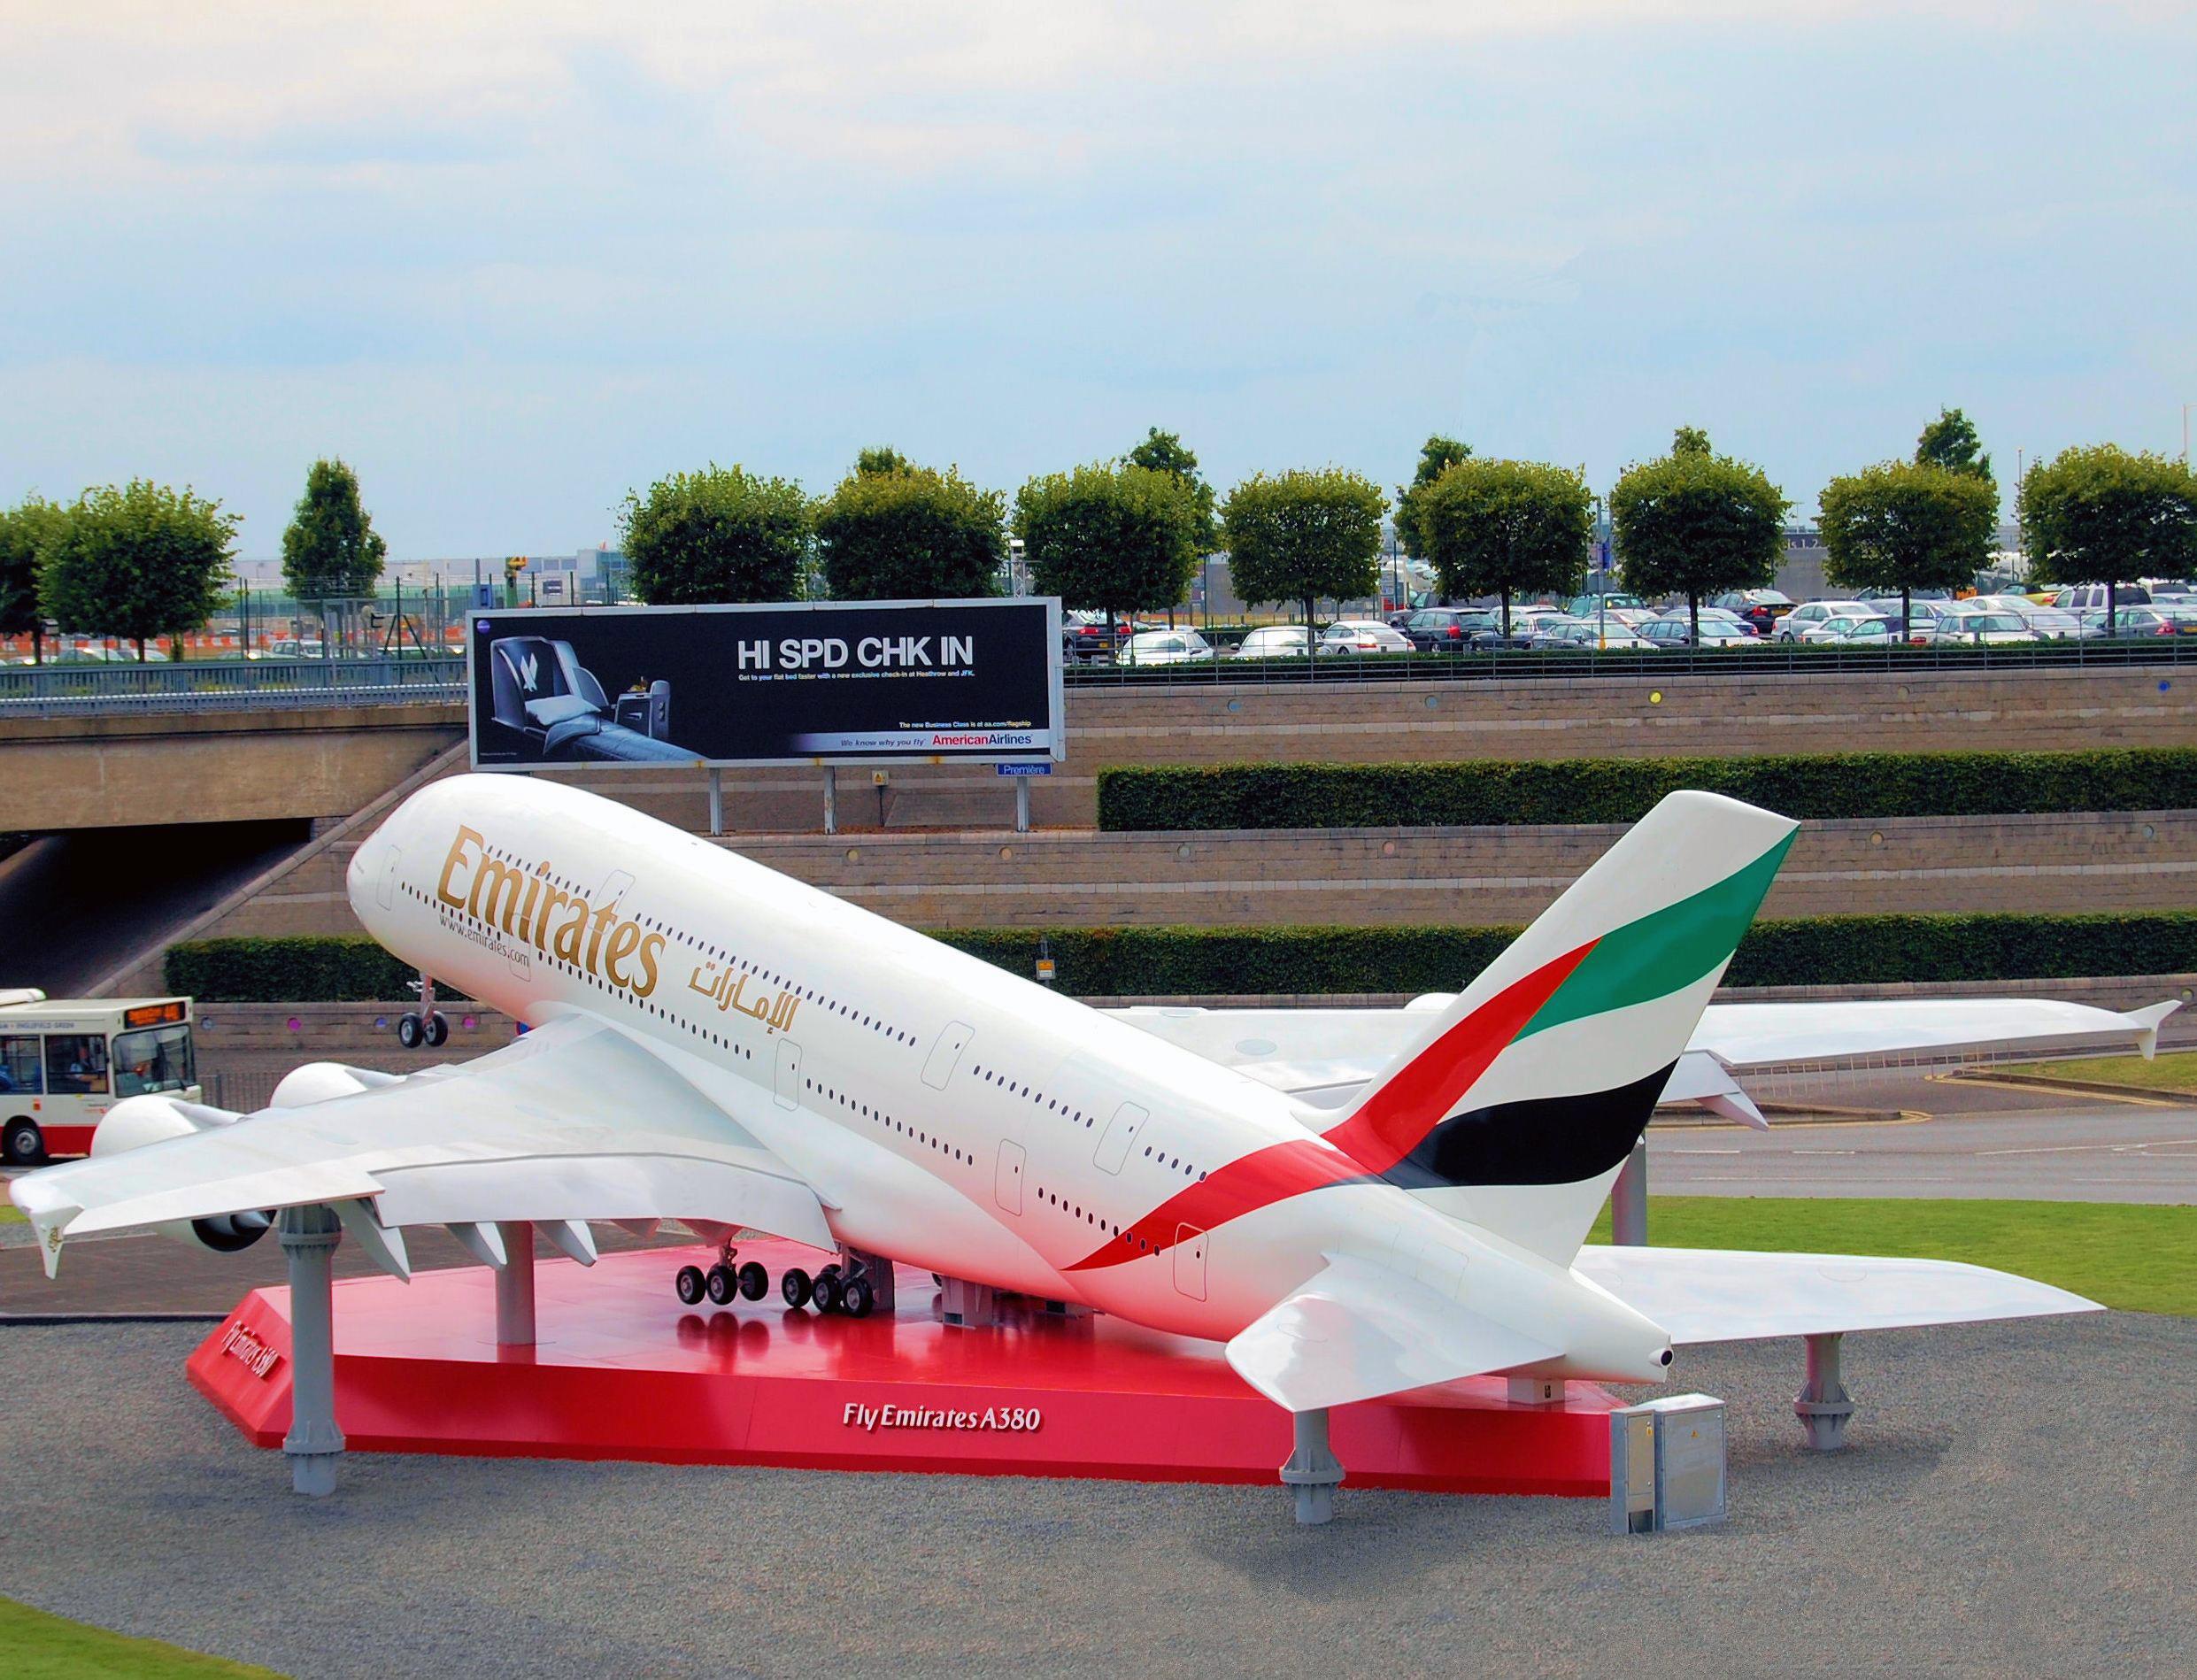 Airbus A380, 1:3 Scale Display (80' wingspan) London Heathrow Airport